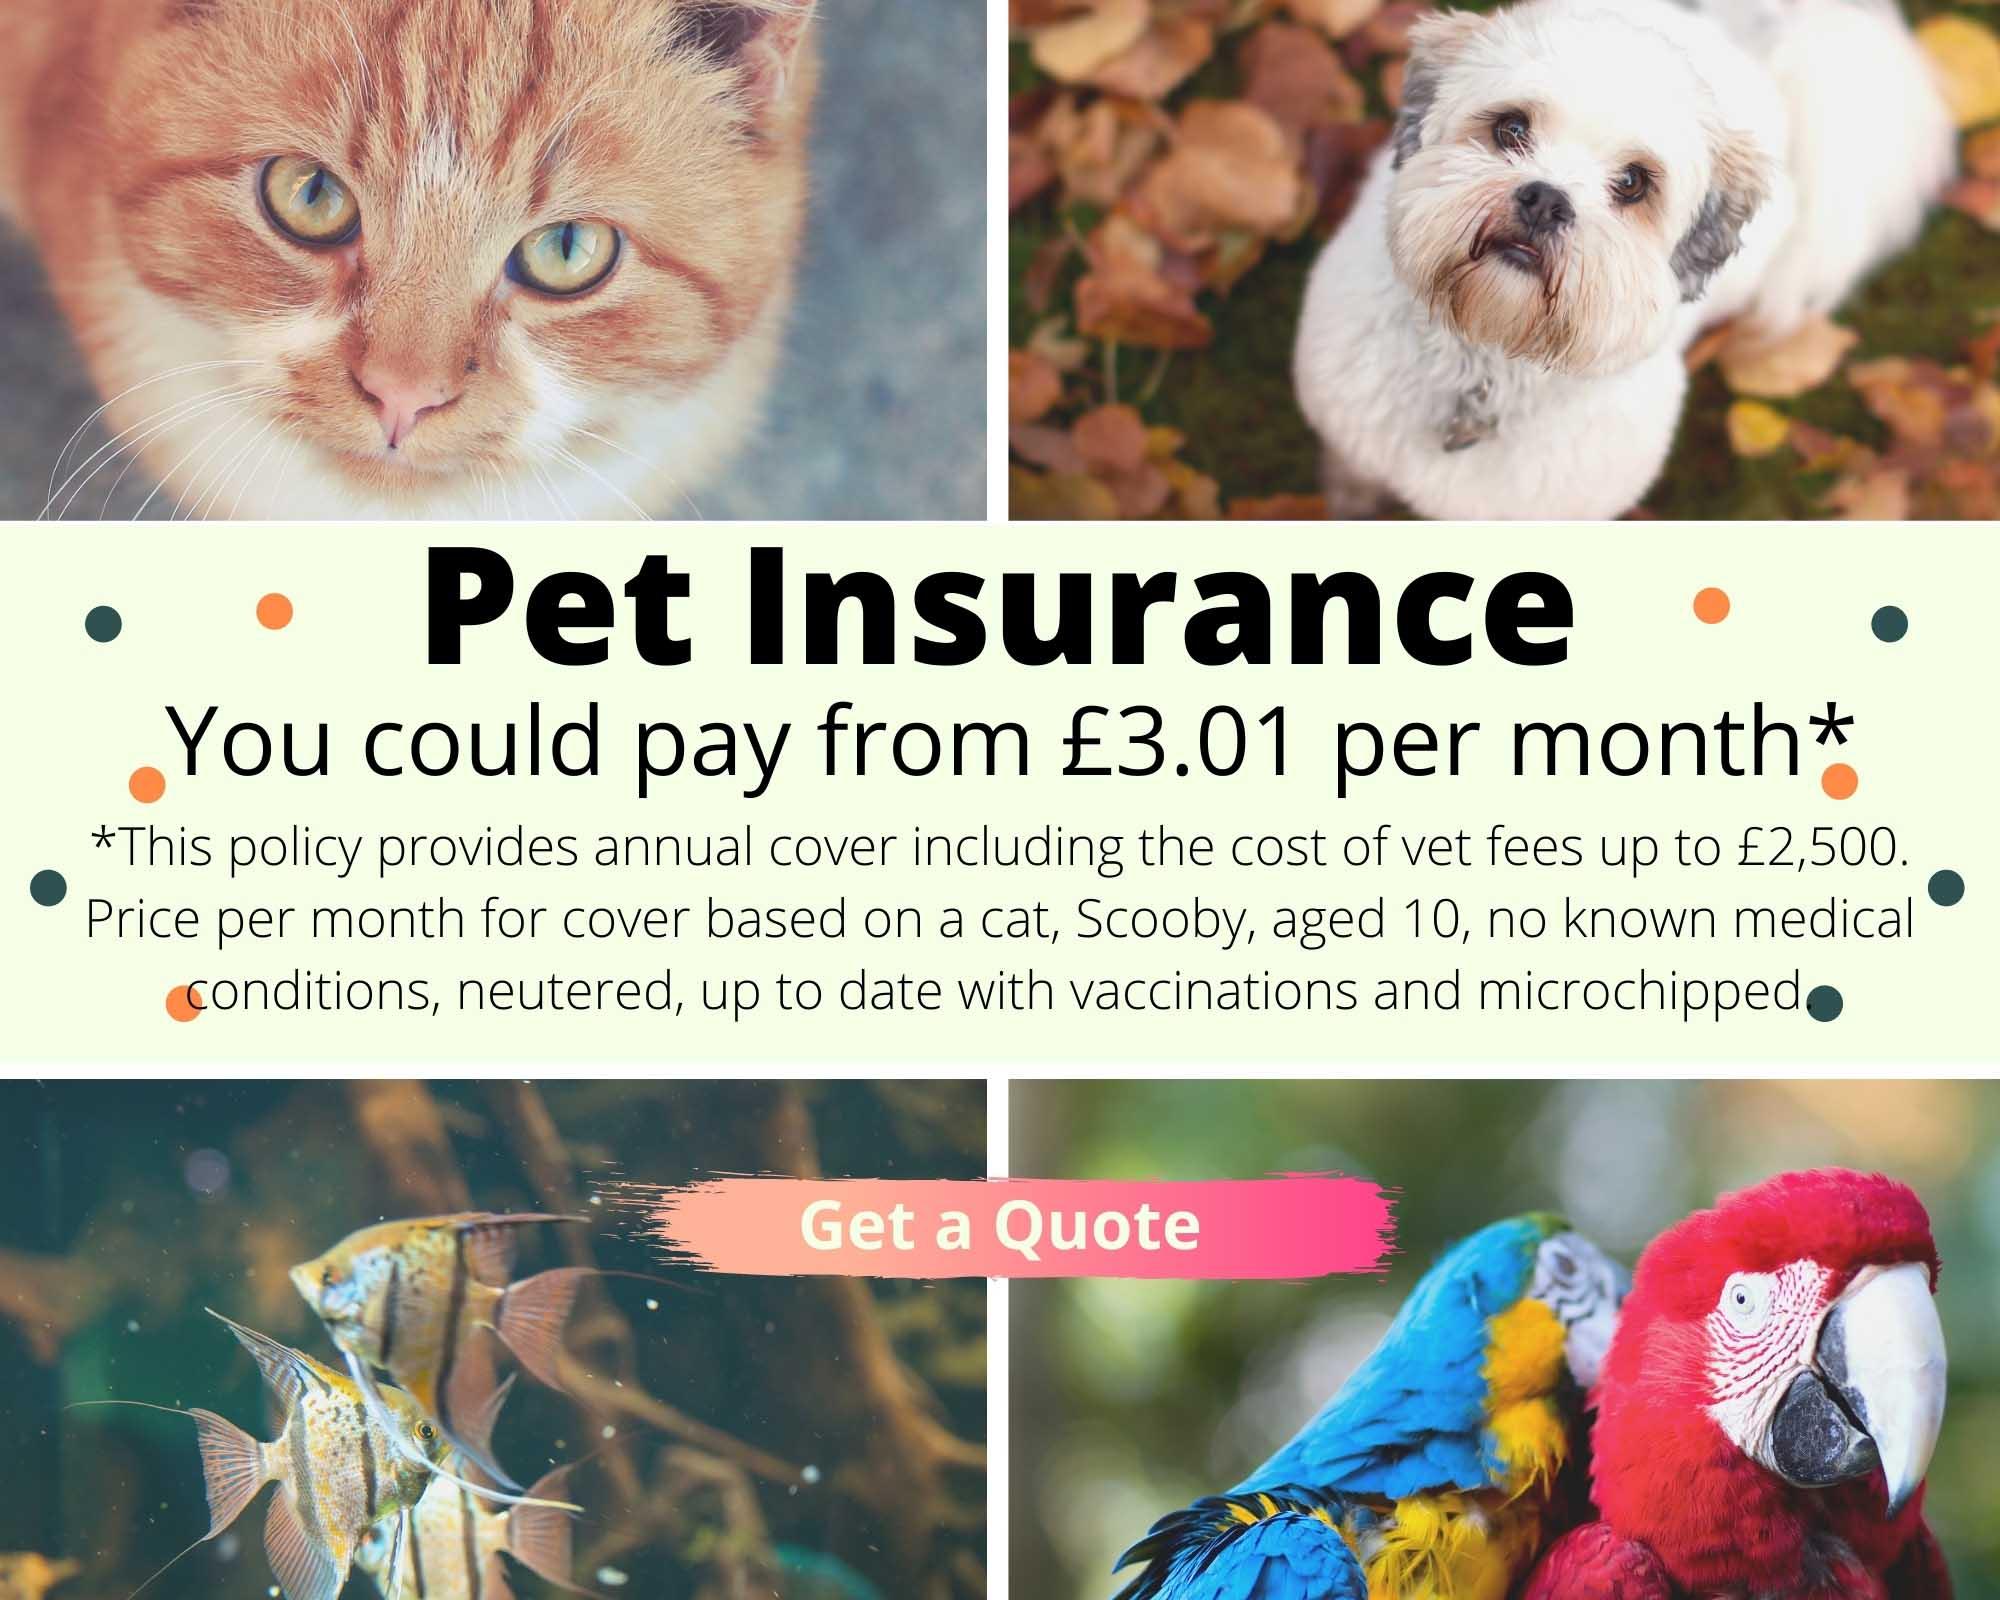 Save on Pet Insurance